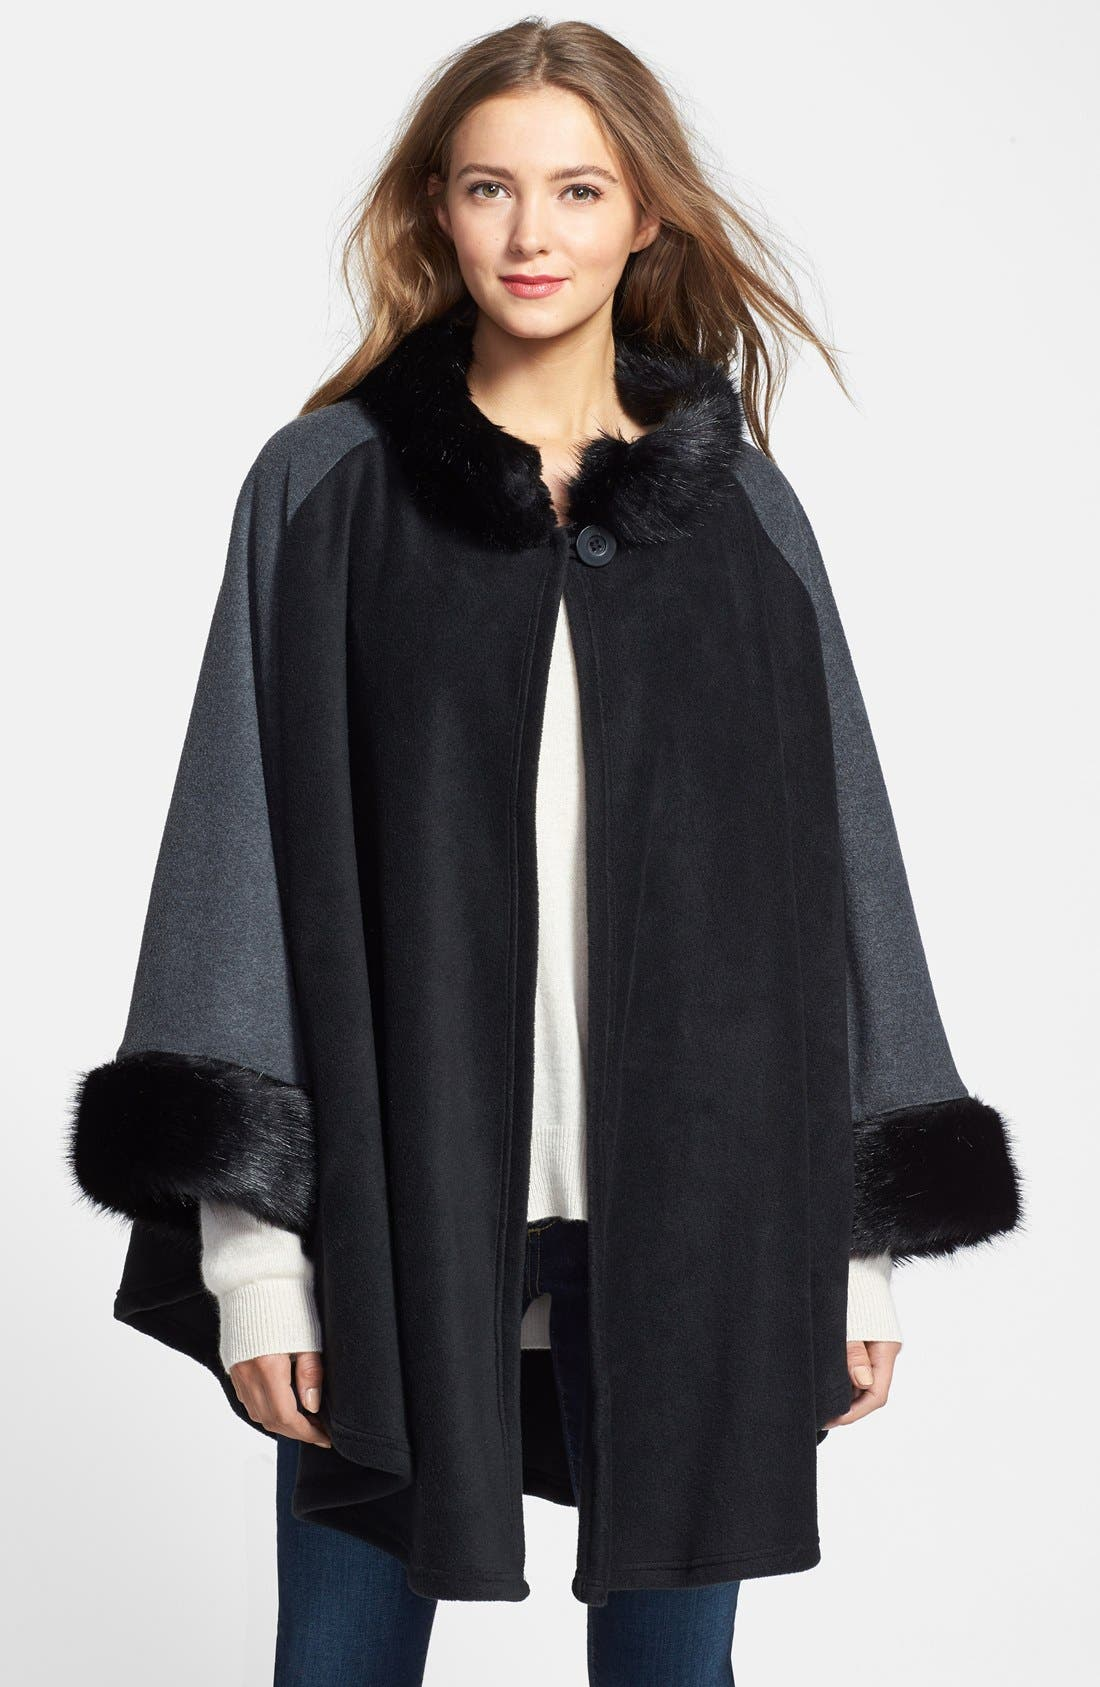 'Karina' Faux Fur Trim Cape,                             Main thumbnail 1, color,                             001